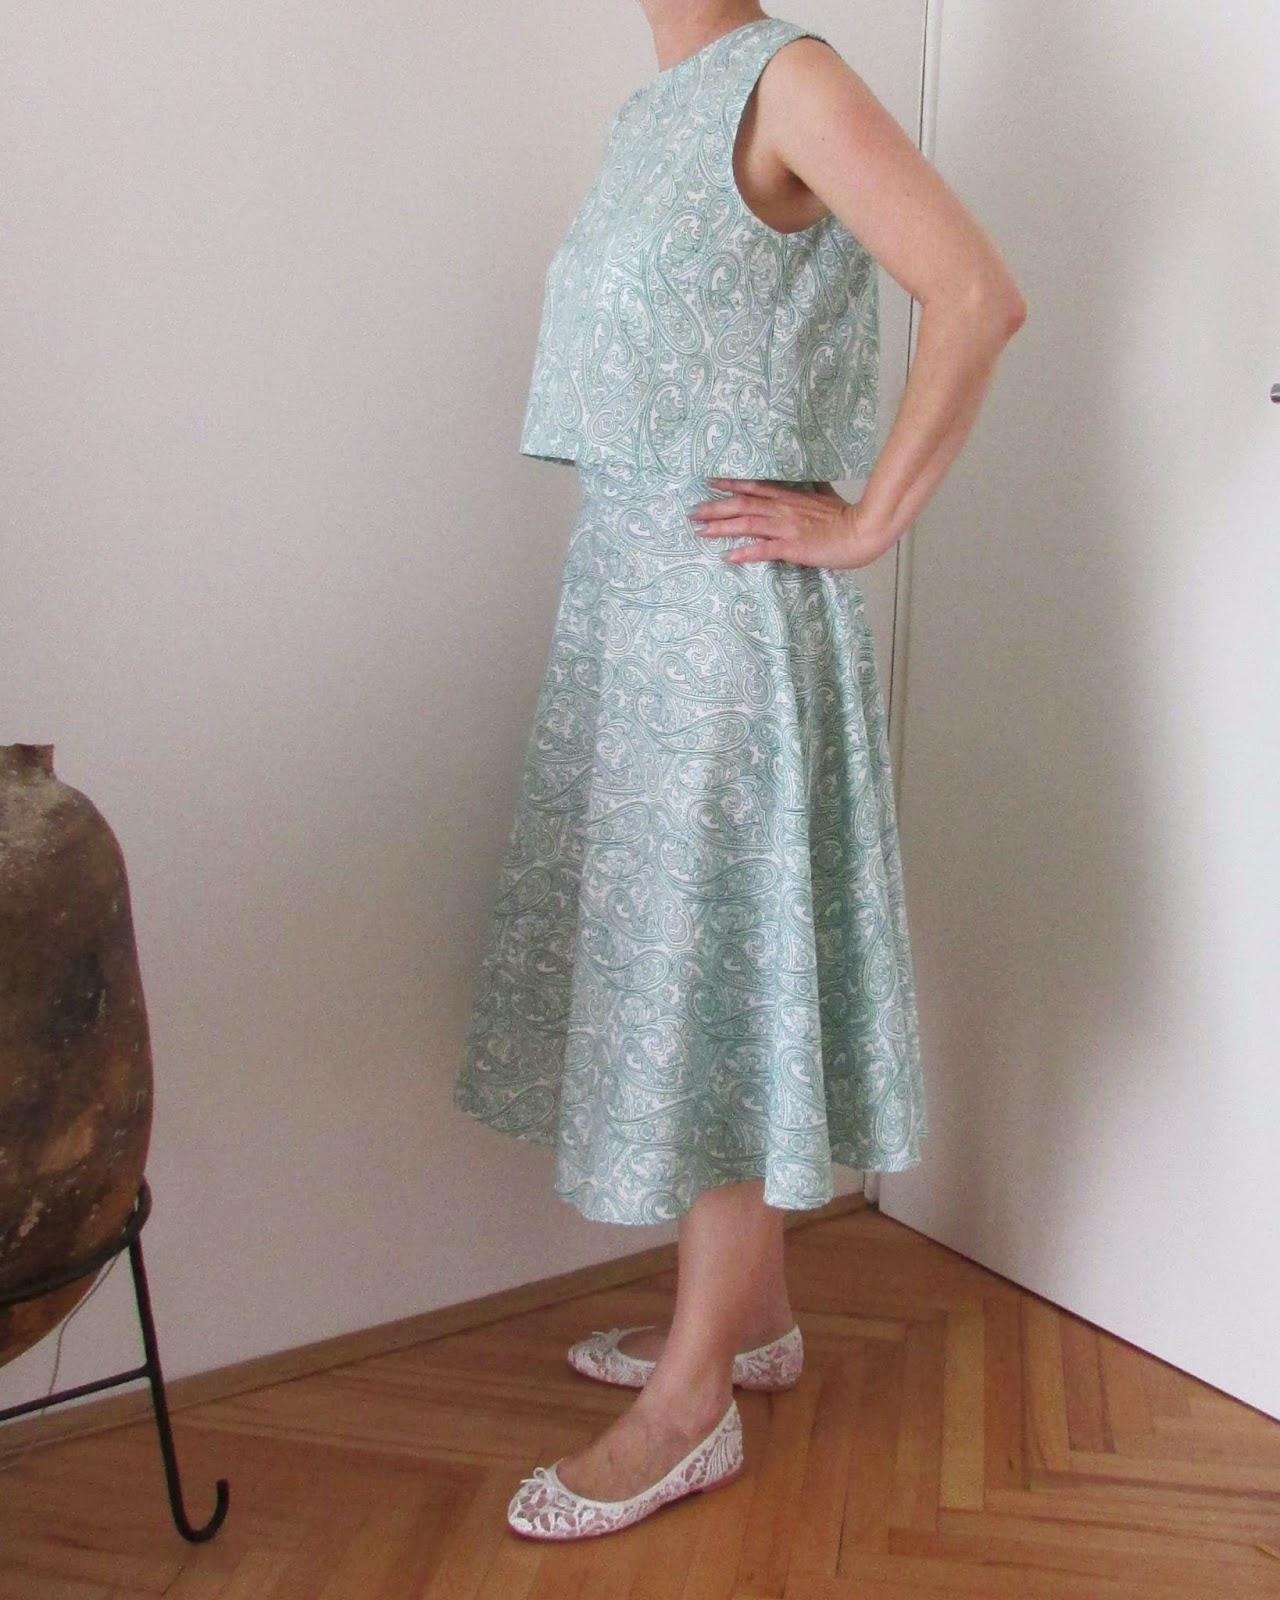 http://ladylinaland.blogspot.com/2014/09/paisley-print-voluminous-skirts-and.html